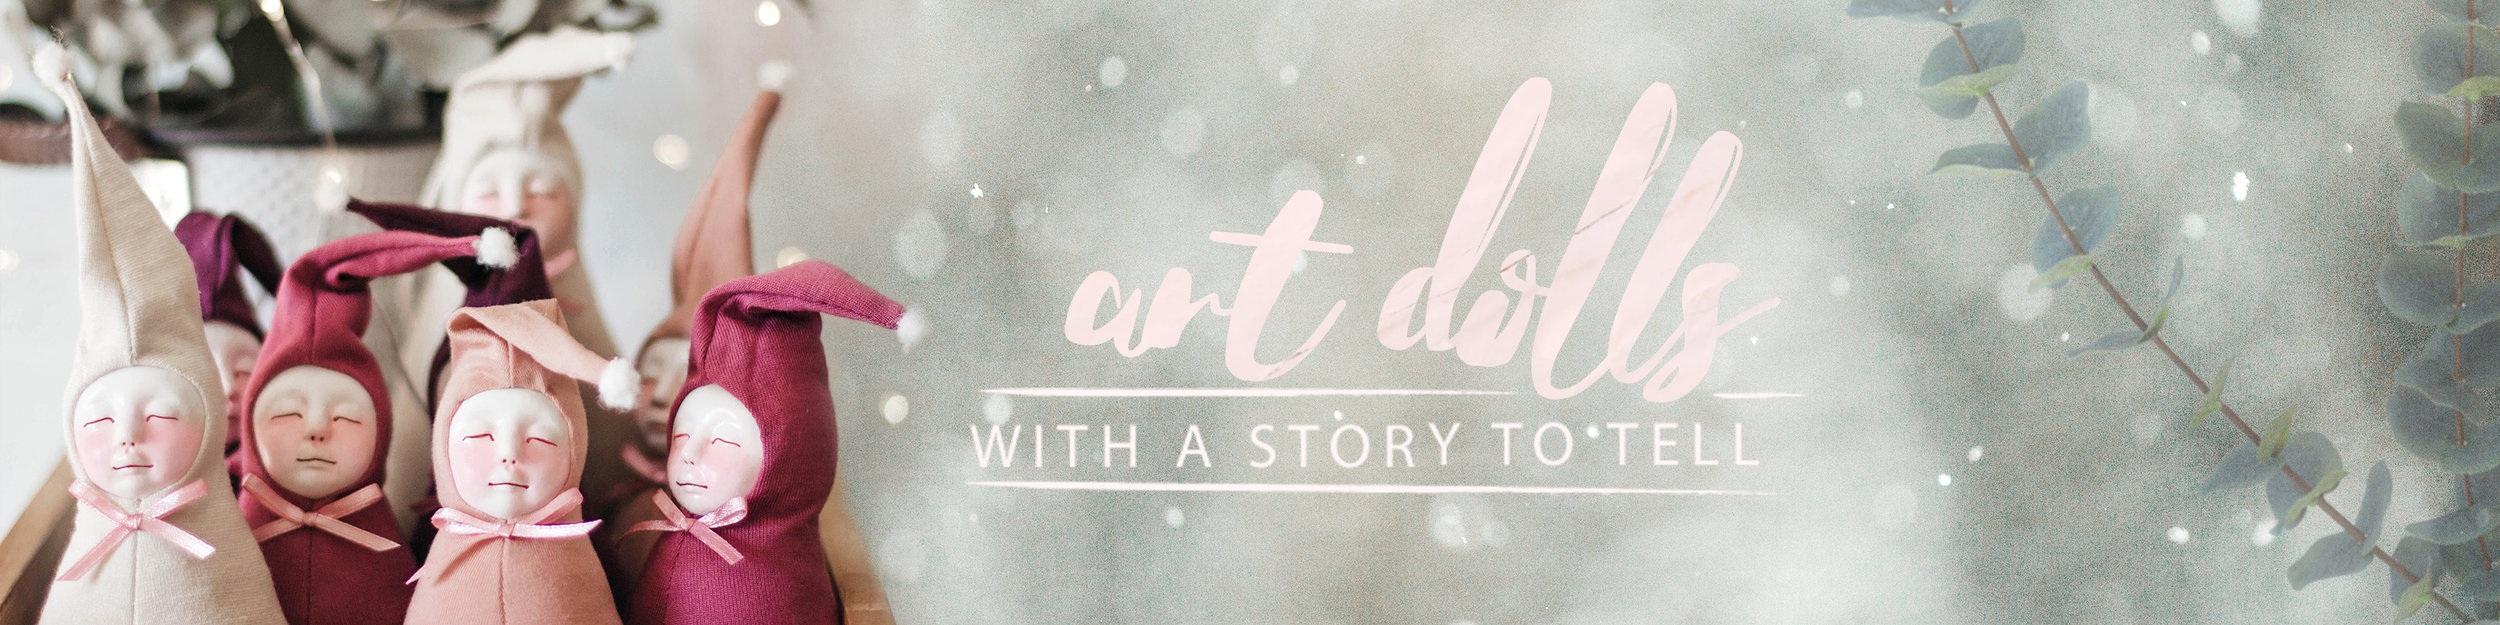 Shop+adelepo+art+dolls